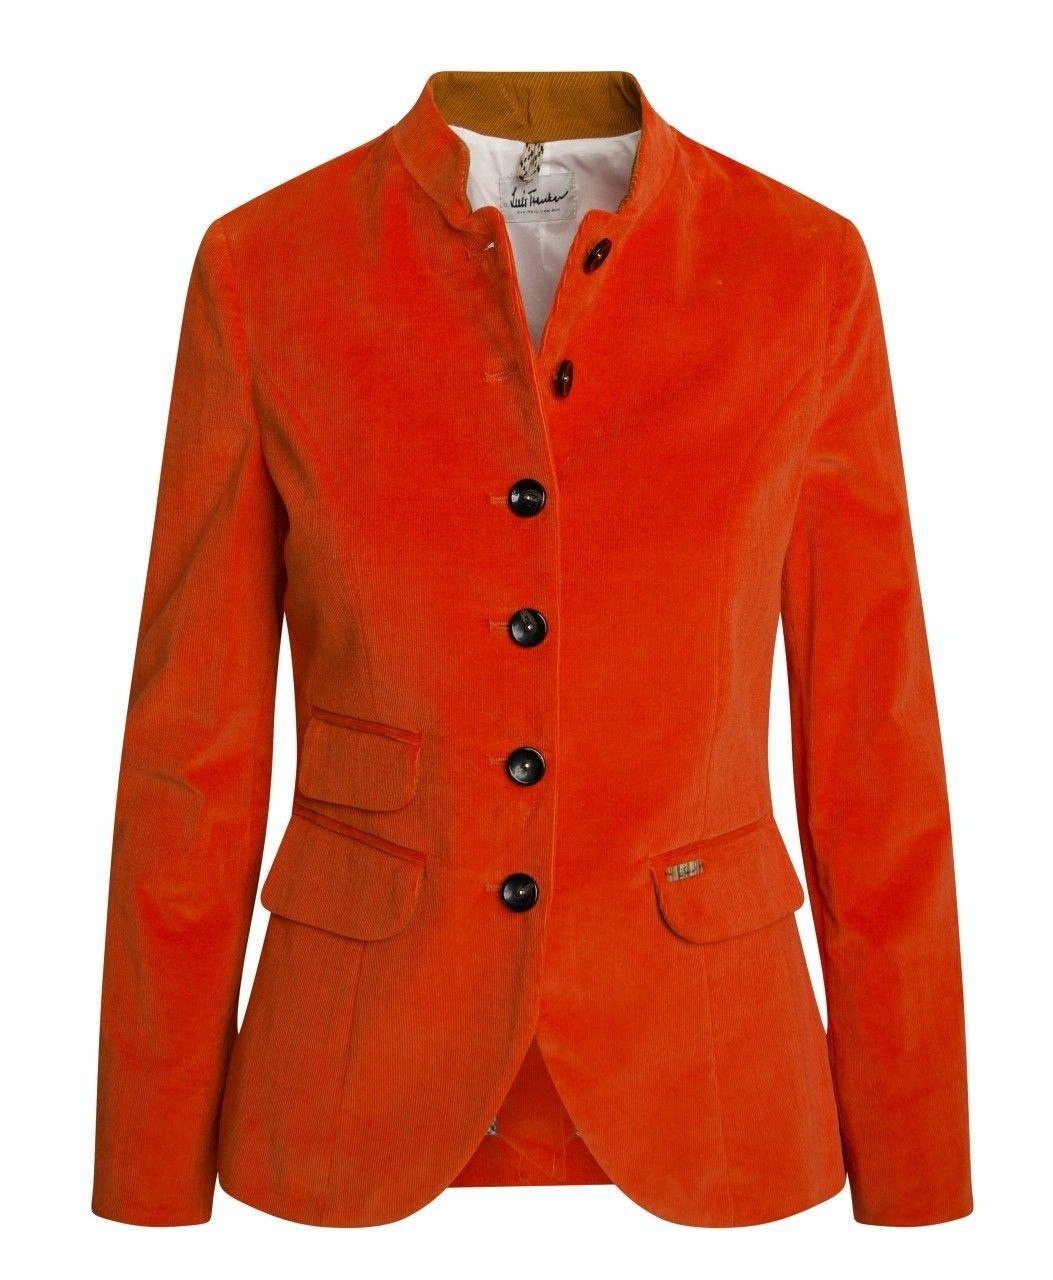 LUIS TRENKER - Damen Blazer - Randa Cord Stretch - Orange